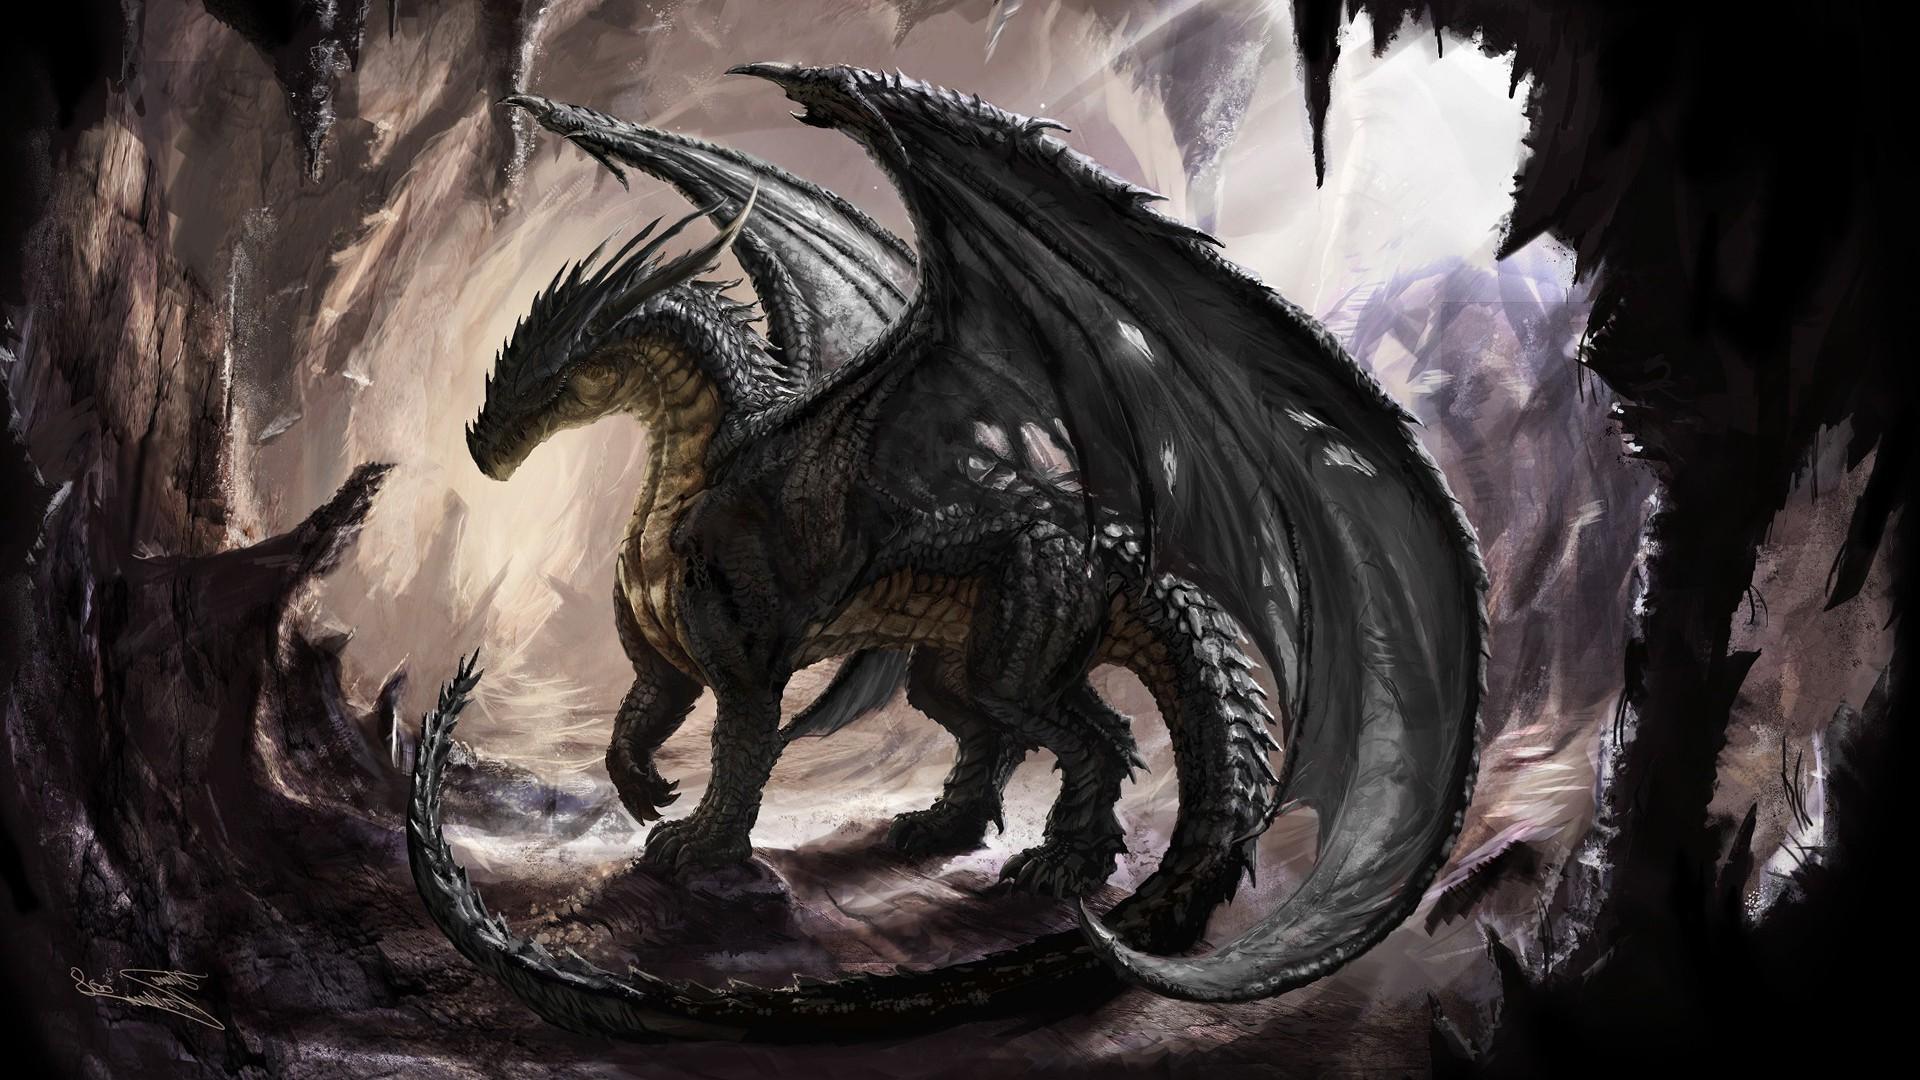 Artwork, Dragon, Fantasy Art Wallpapers Hd / Desktop - Black Dragon Fantasy Art - HD Wallpaper